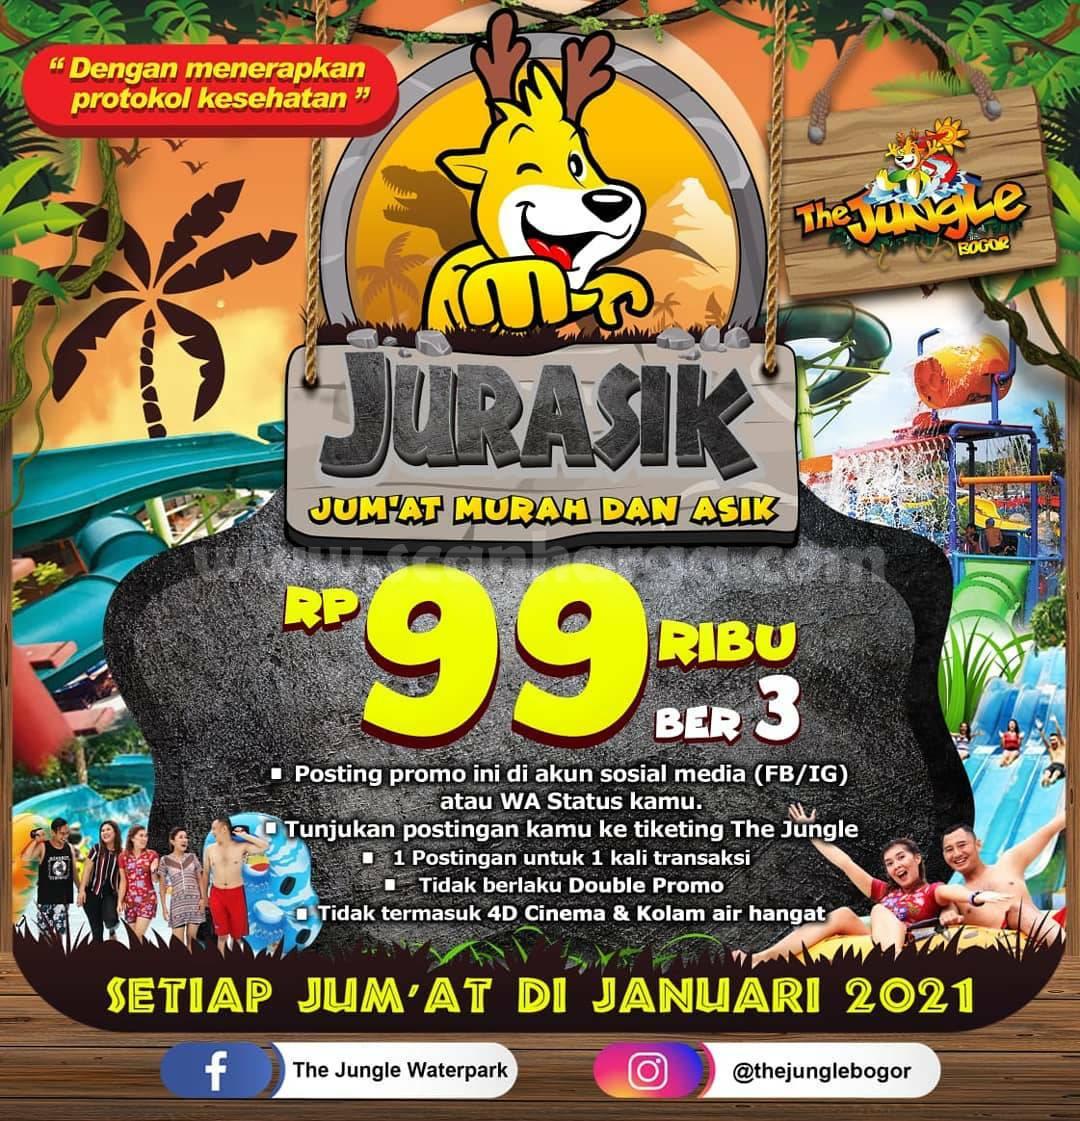 The Jungle Bogor Promo SOSMED! JURASIK (Jum'at Murah Dan Asik) Hanya Rp. 99.000 BER-3